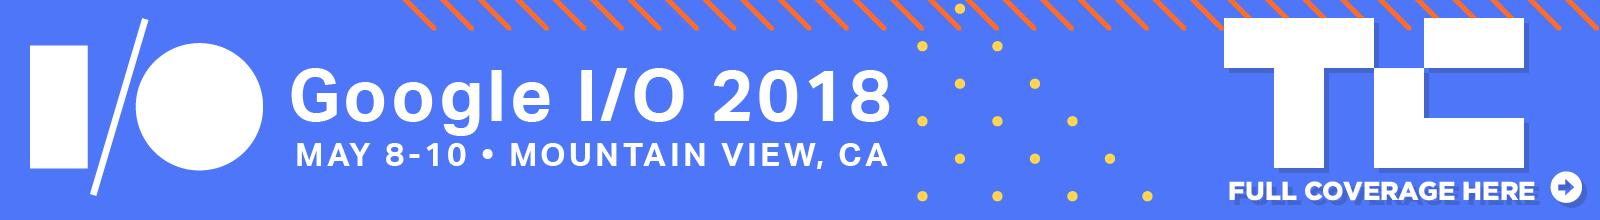 google io 2018 banne 10